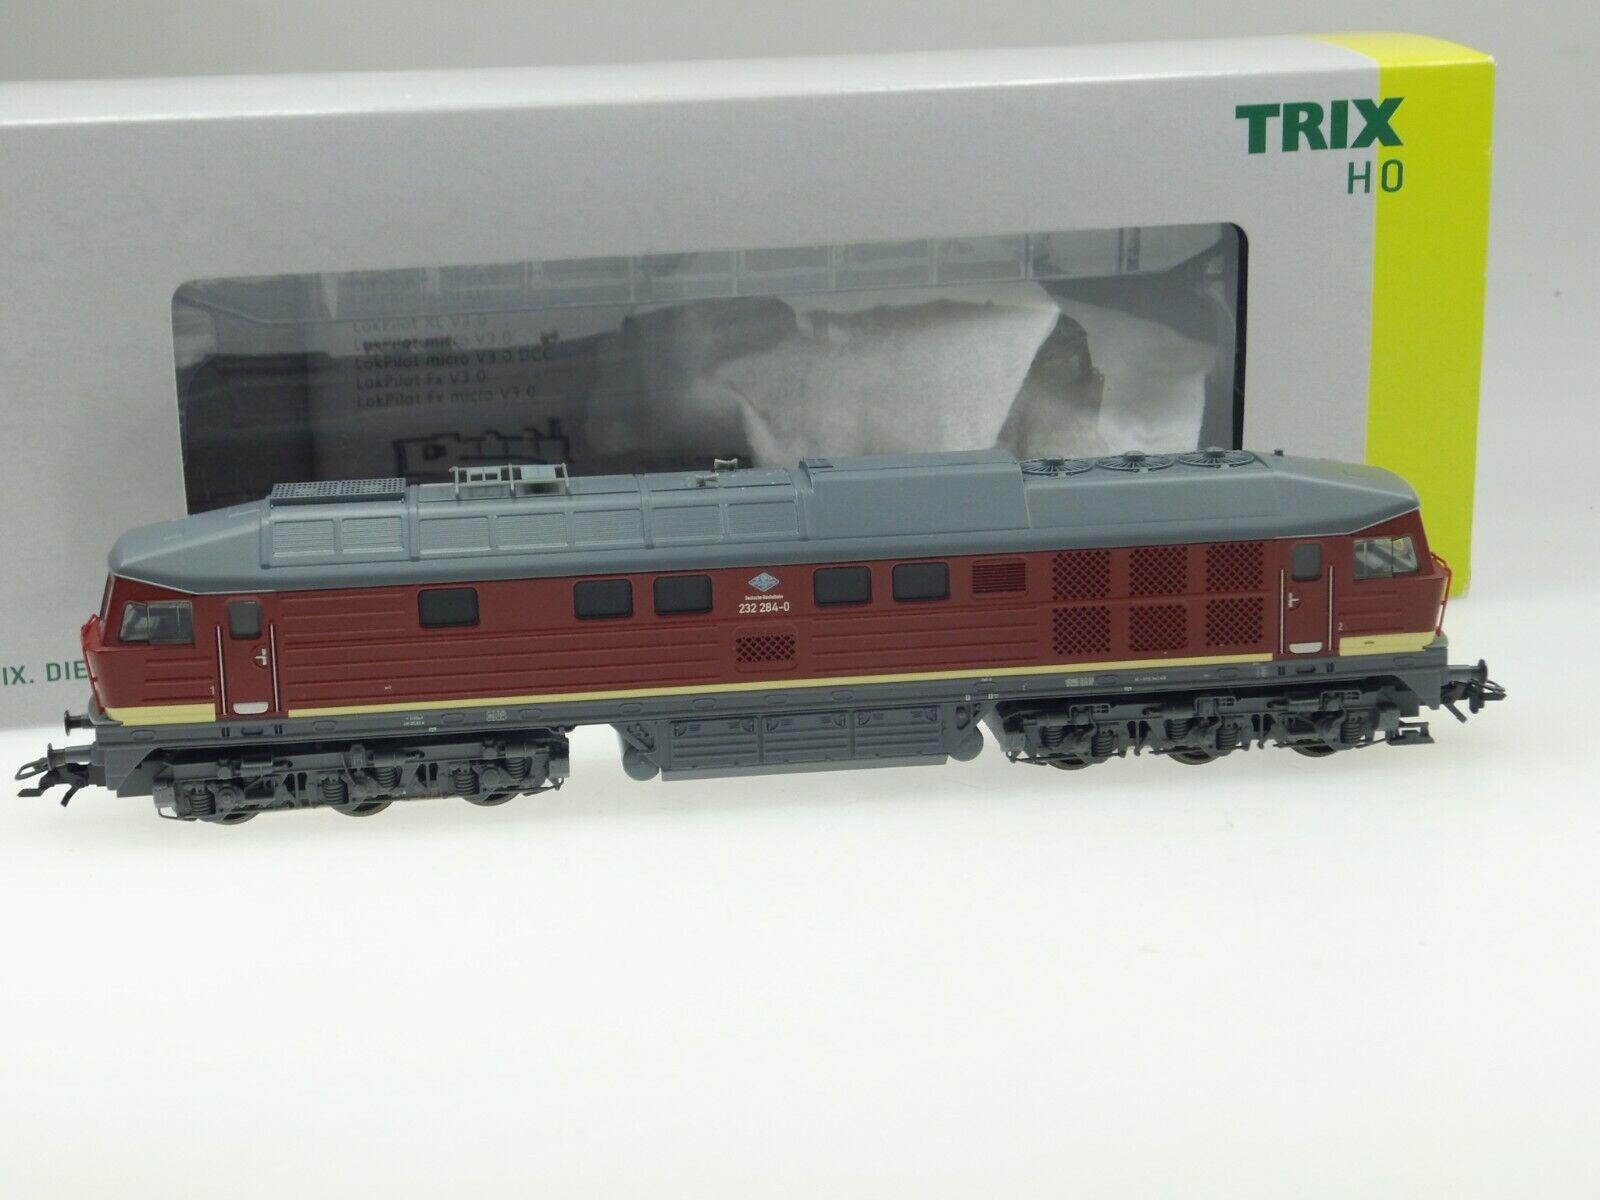 (87 506) Trix H0 Locomotora Diésel Br 232 284-0  Ludmilla  Dr (Art Nr.22067) AC